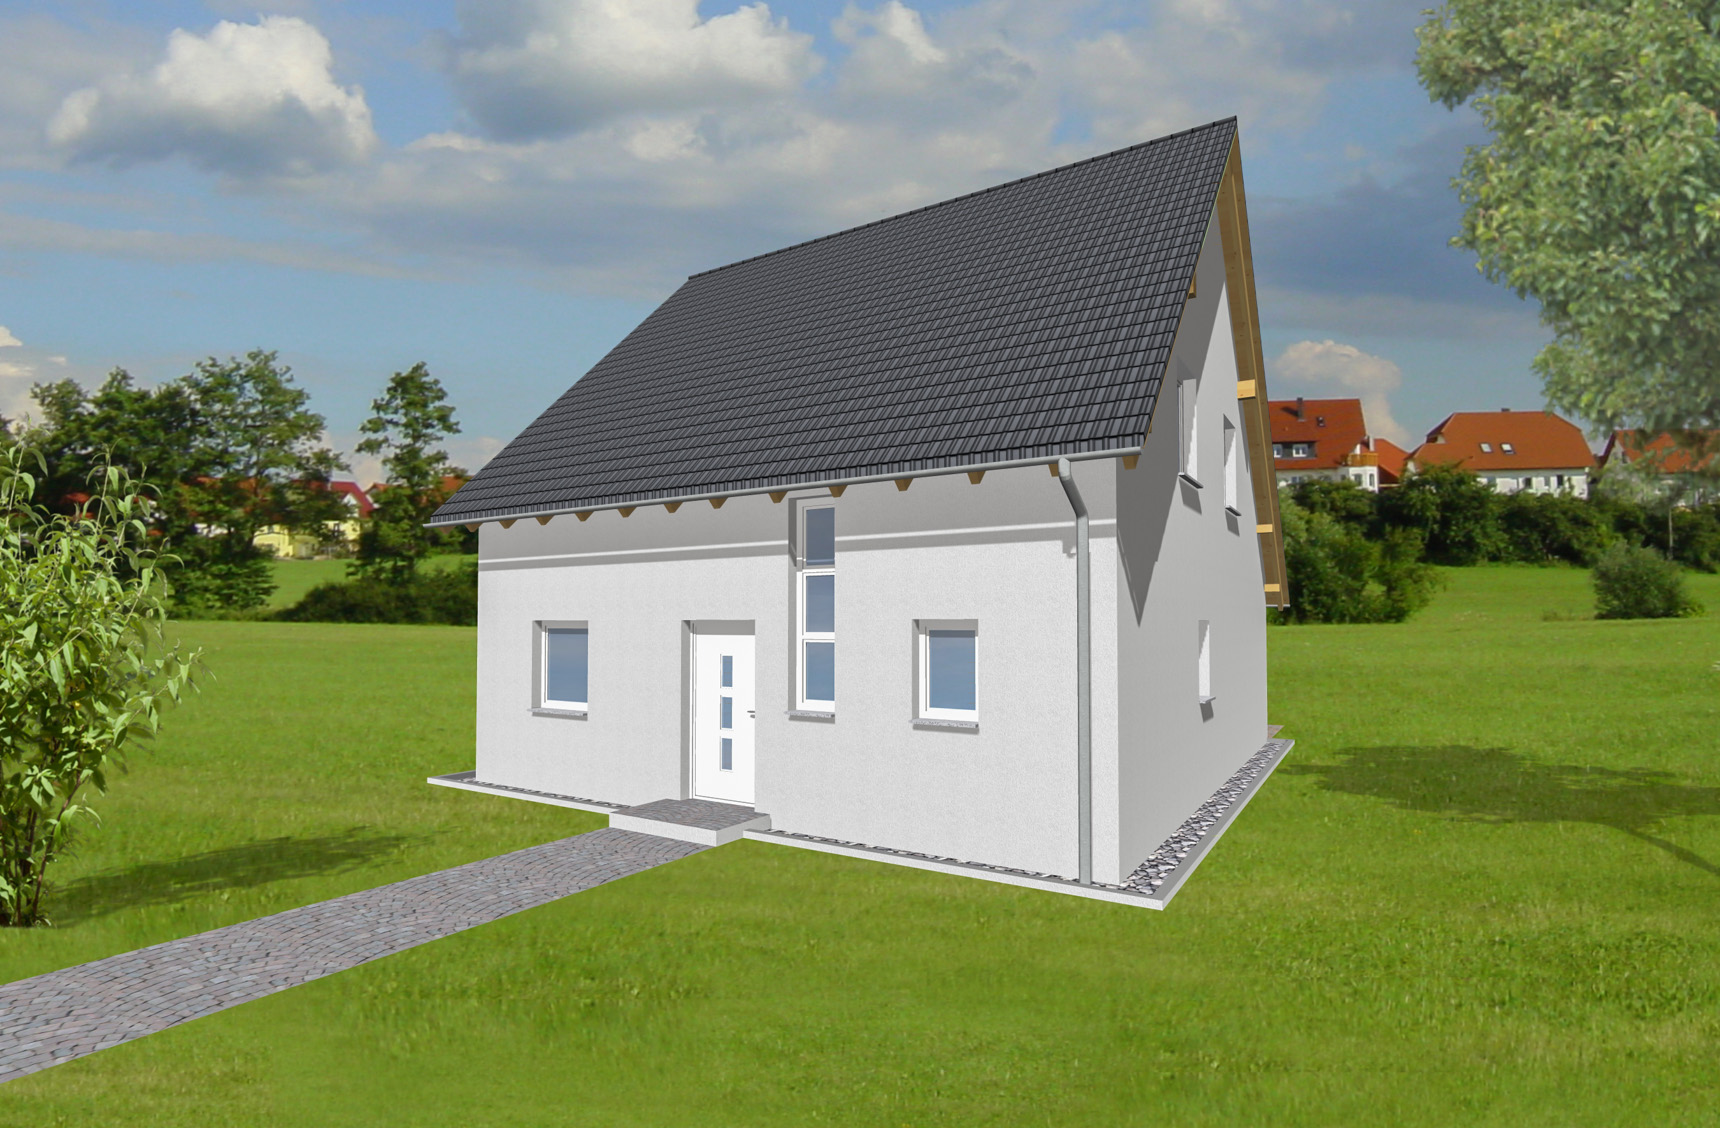 Typenhaus Naos - ALG Massivhaus GmbH Eingangsansicht